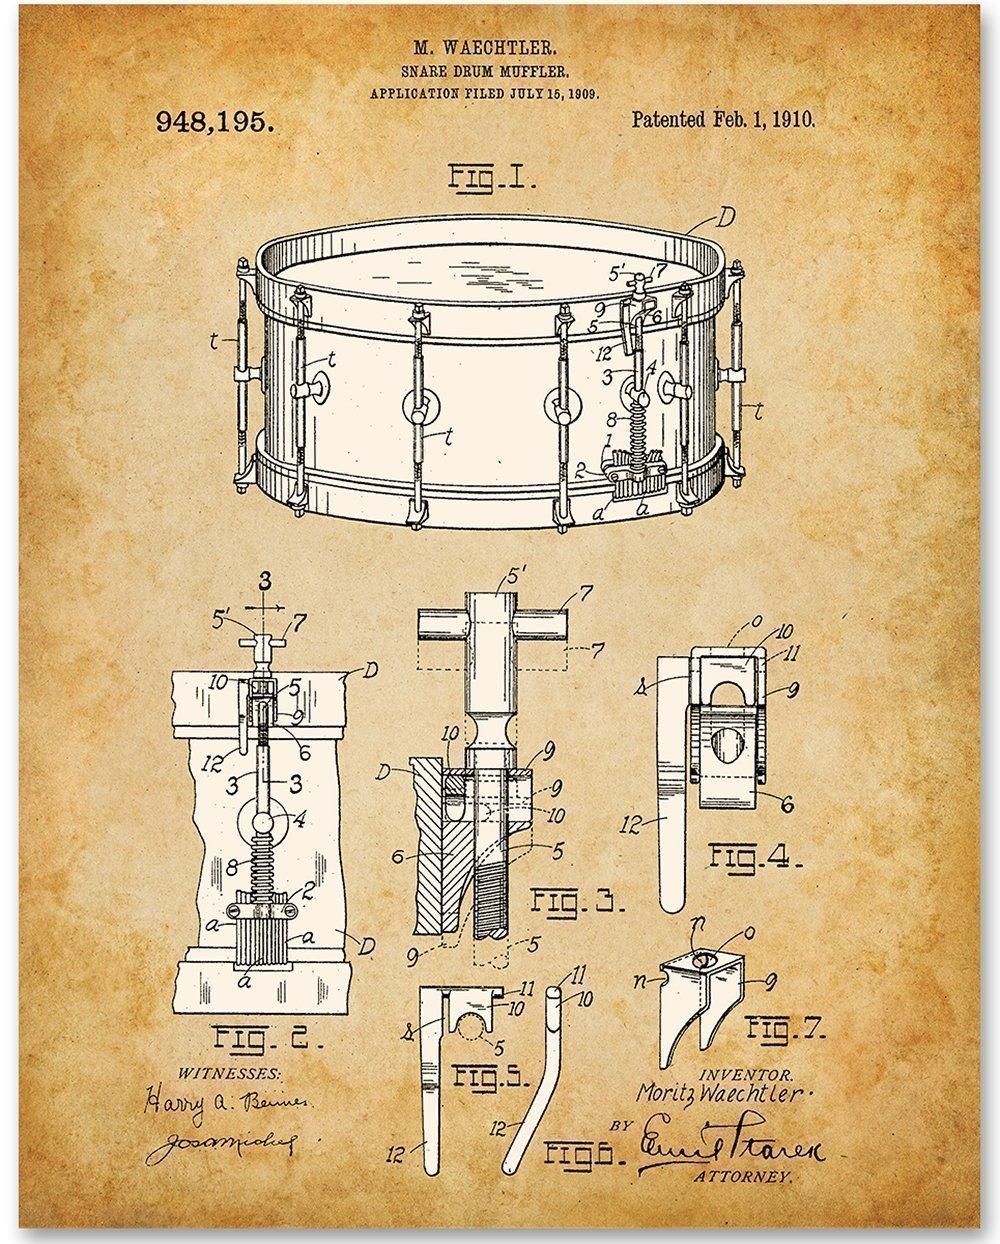 Waechtler Snare Drum Patent 11x14 Unframed Diagram Print Great Gift For Drummers Handmade